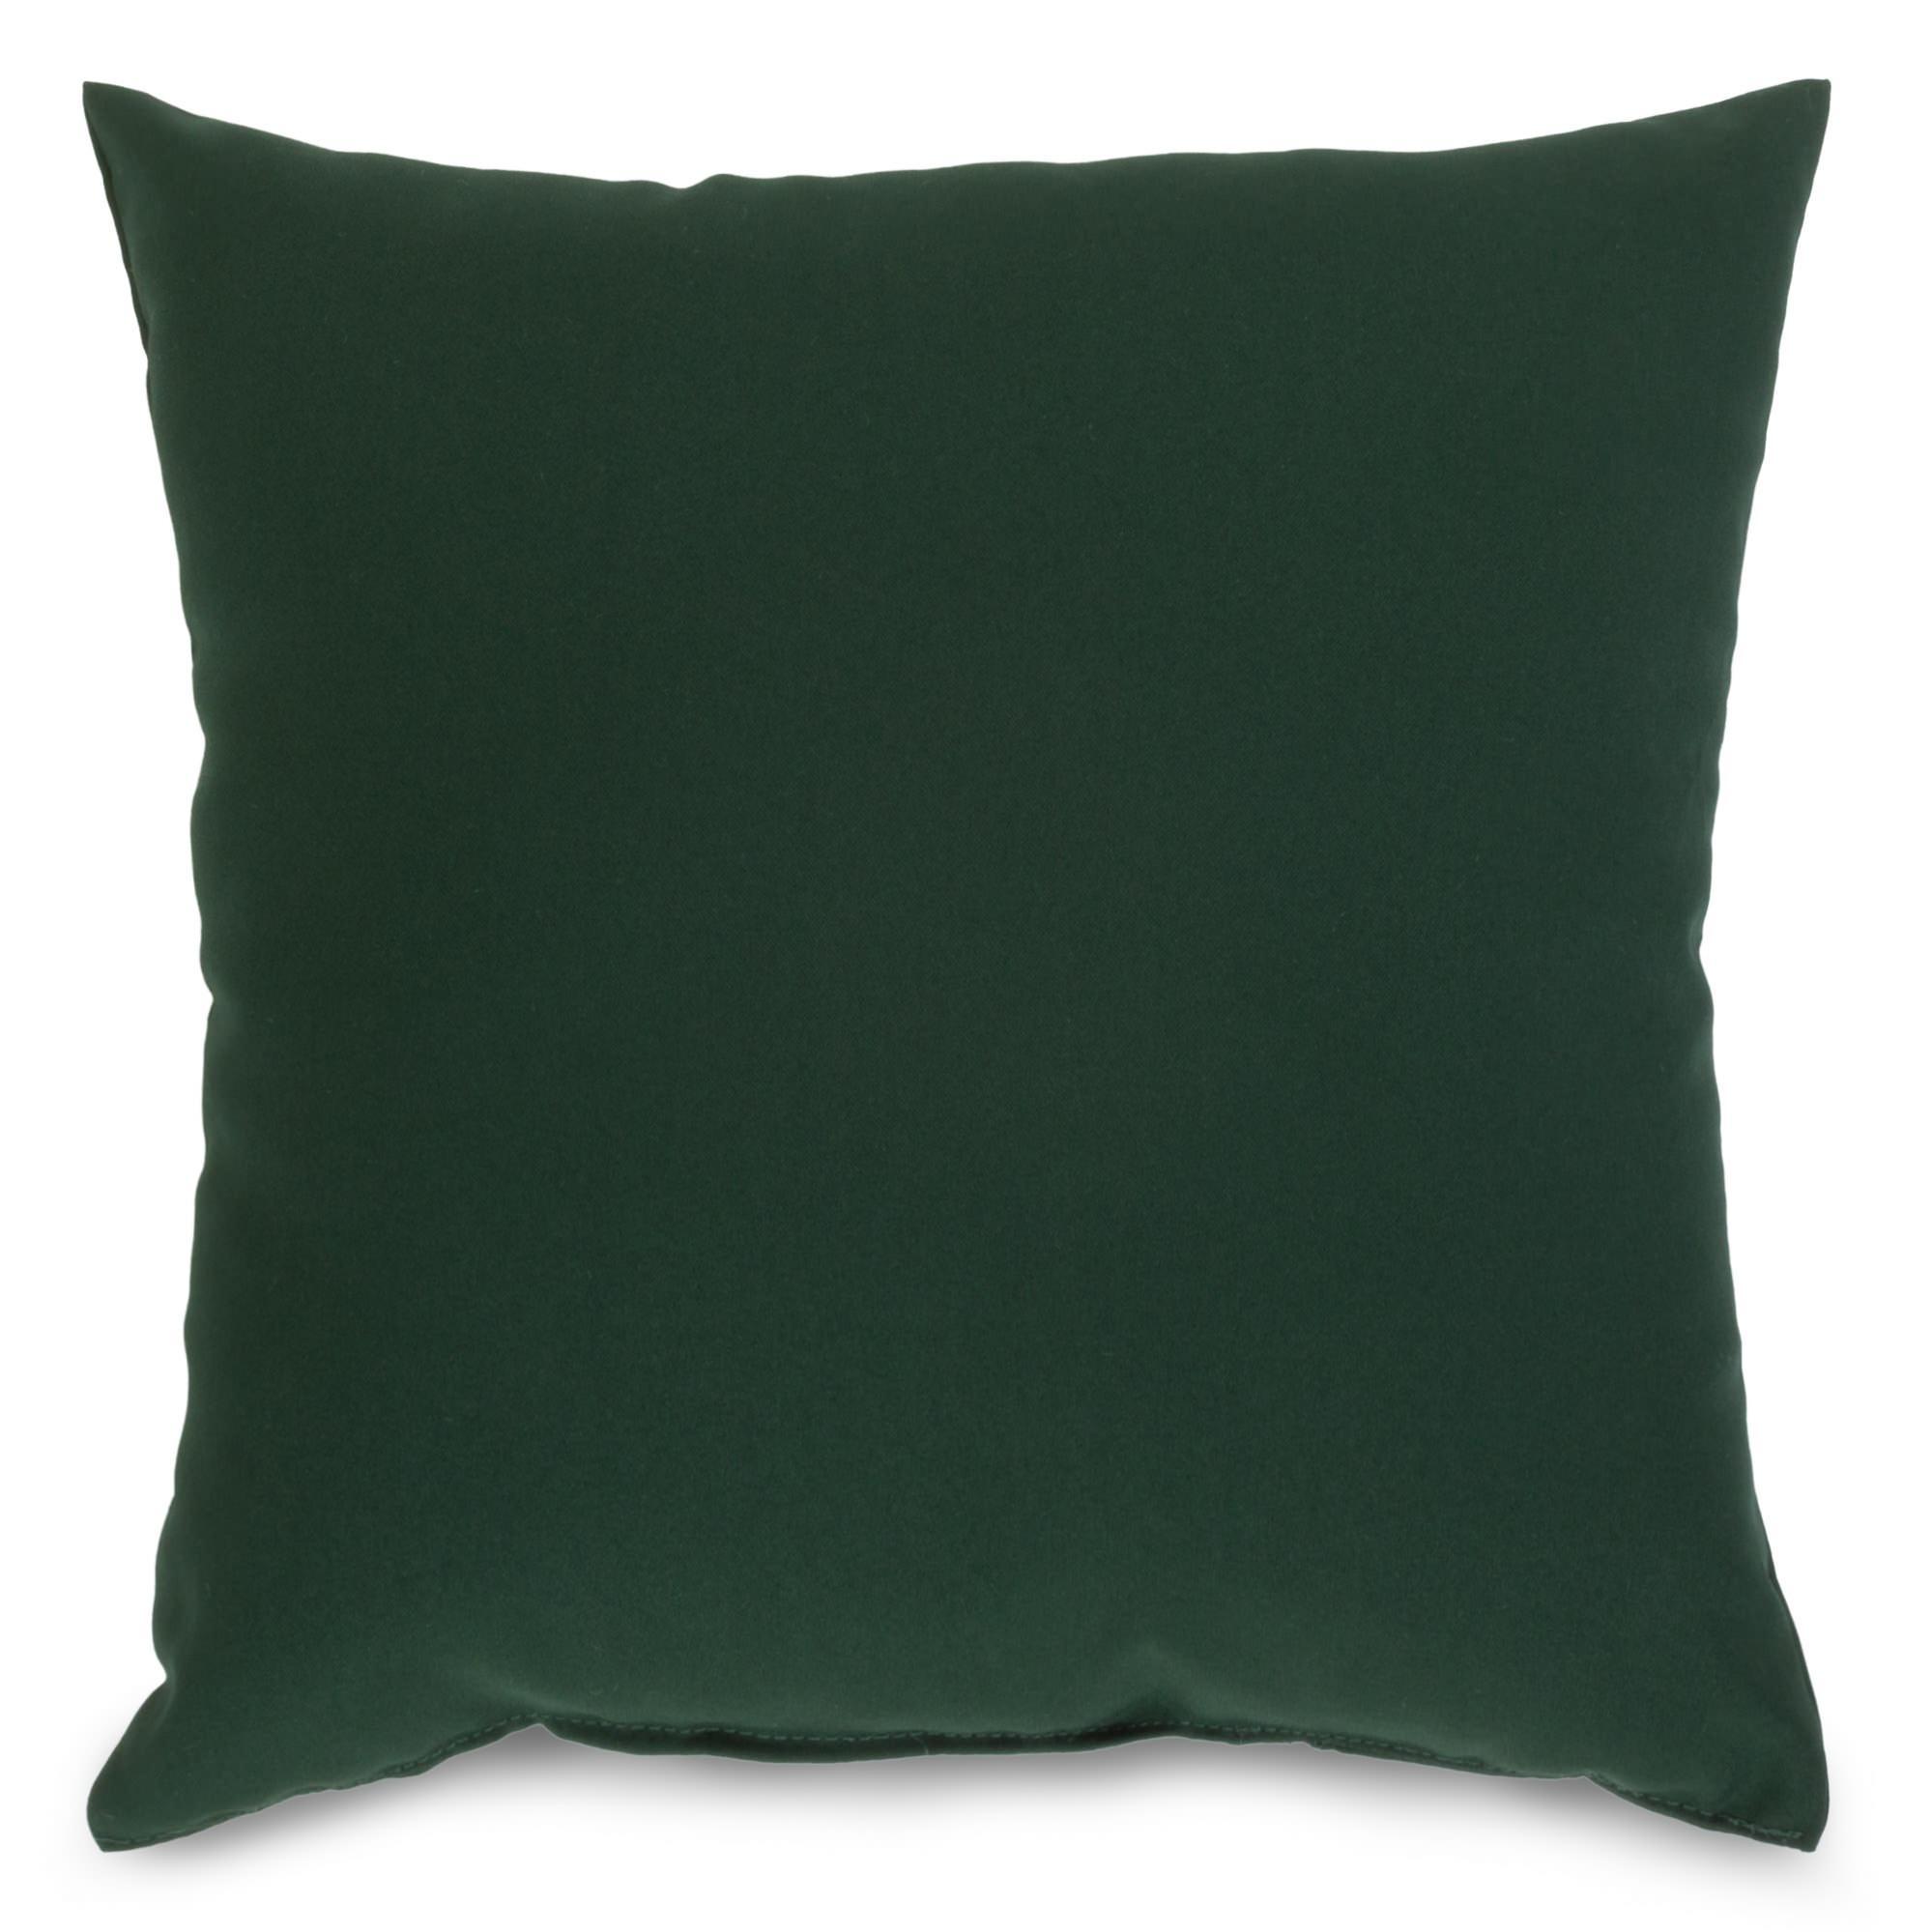 Green Outdoor Throw Pillow  BSQIGRK  DFOHome